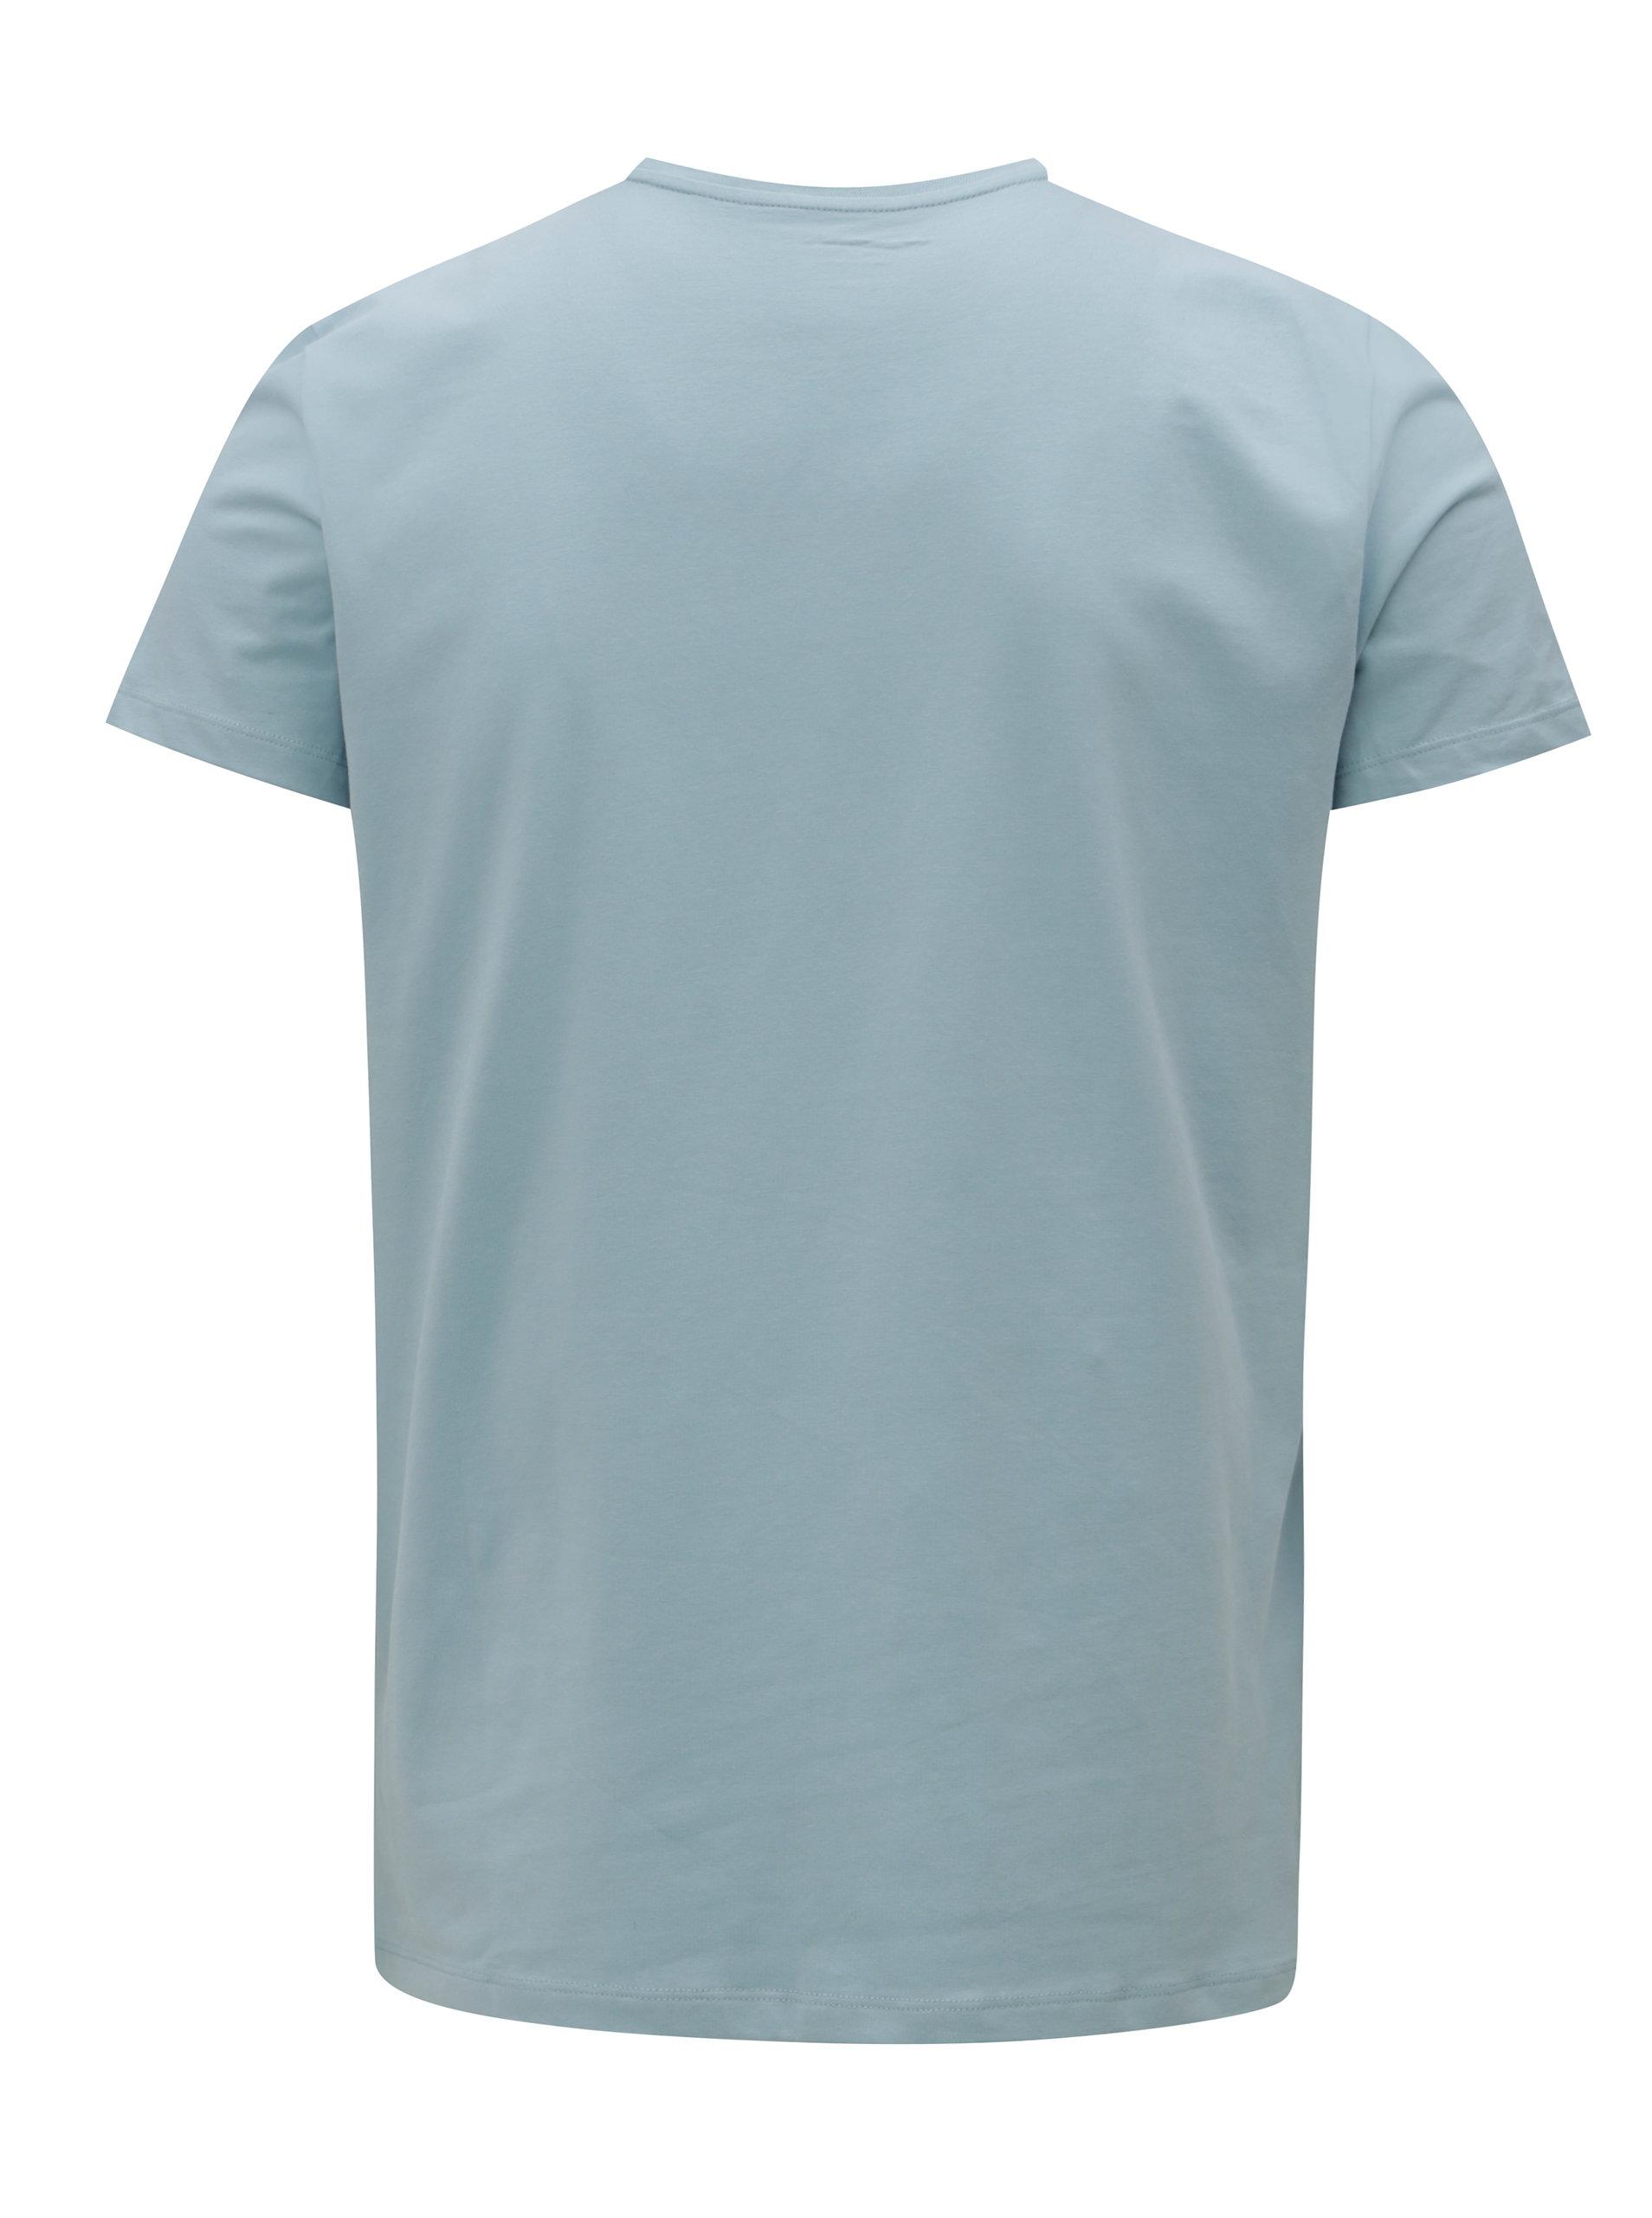 Modré pánské slim tričko s potiskem Pepe Jeans Original stretch ... b59fc1fcbf